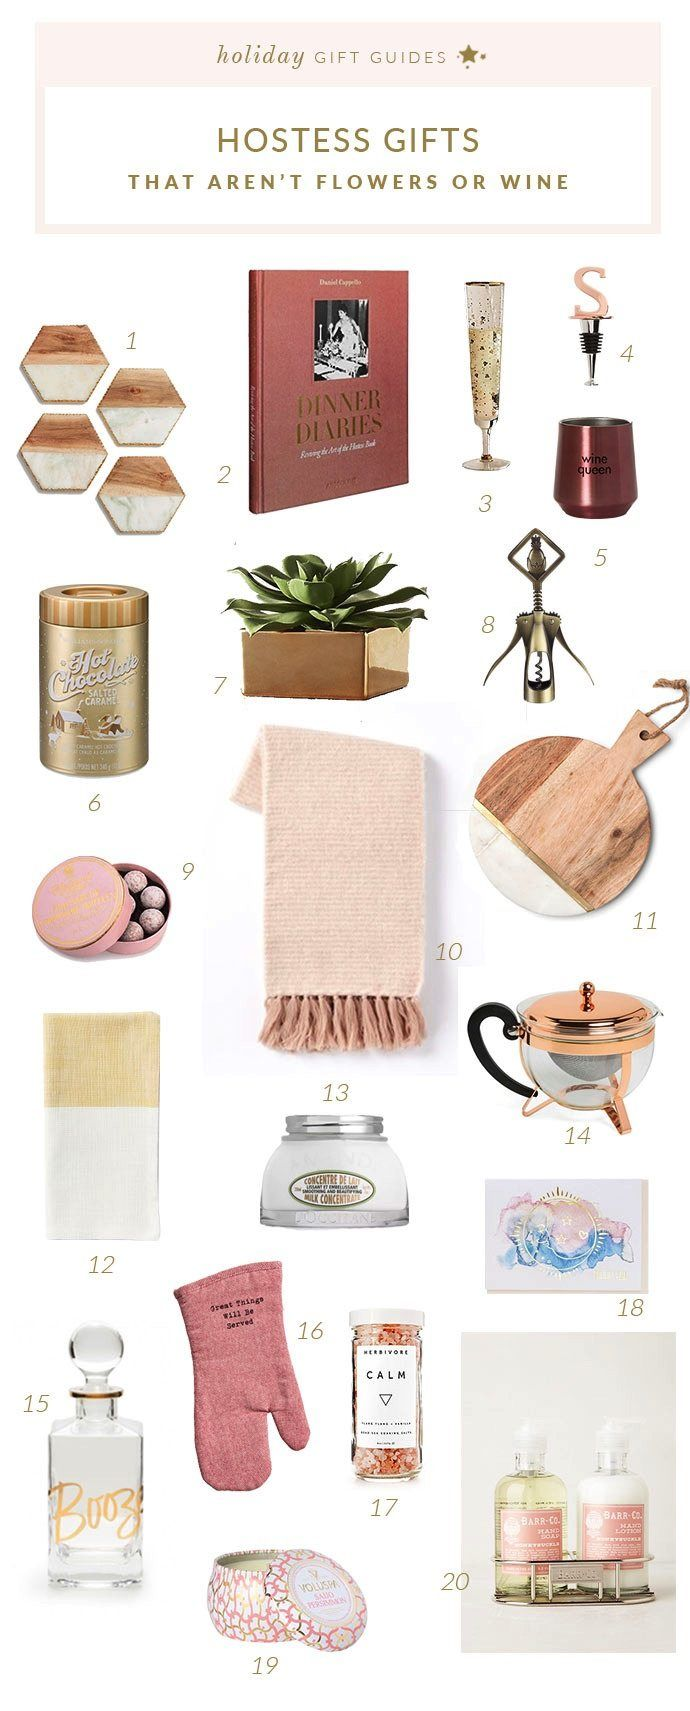 20 Hostess Gift Ideas That Aren't a Bottle of Wine